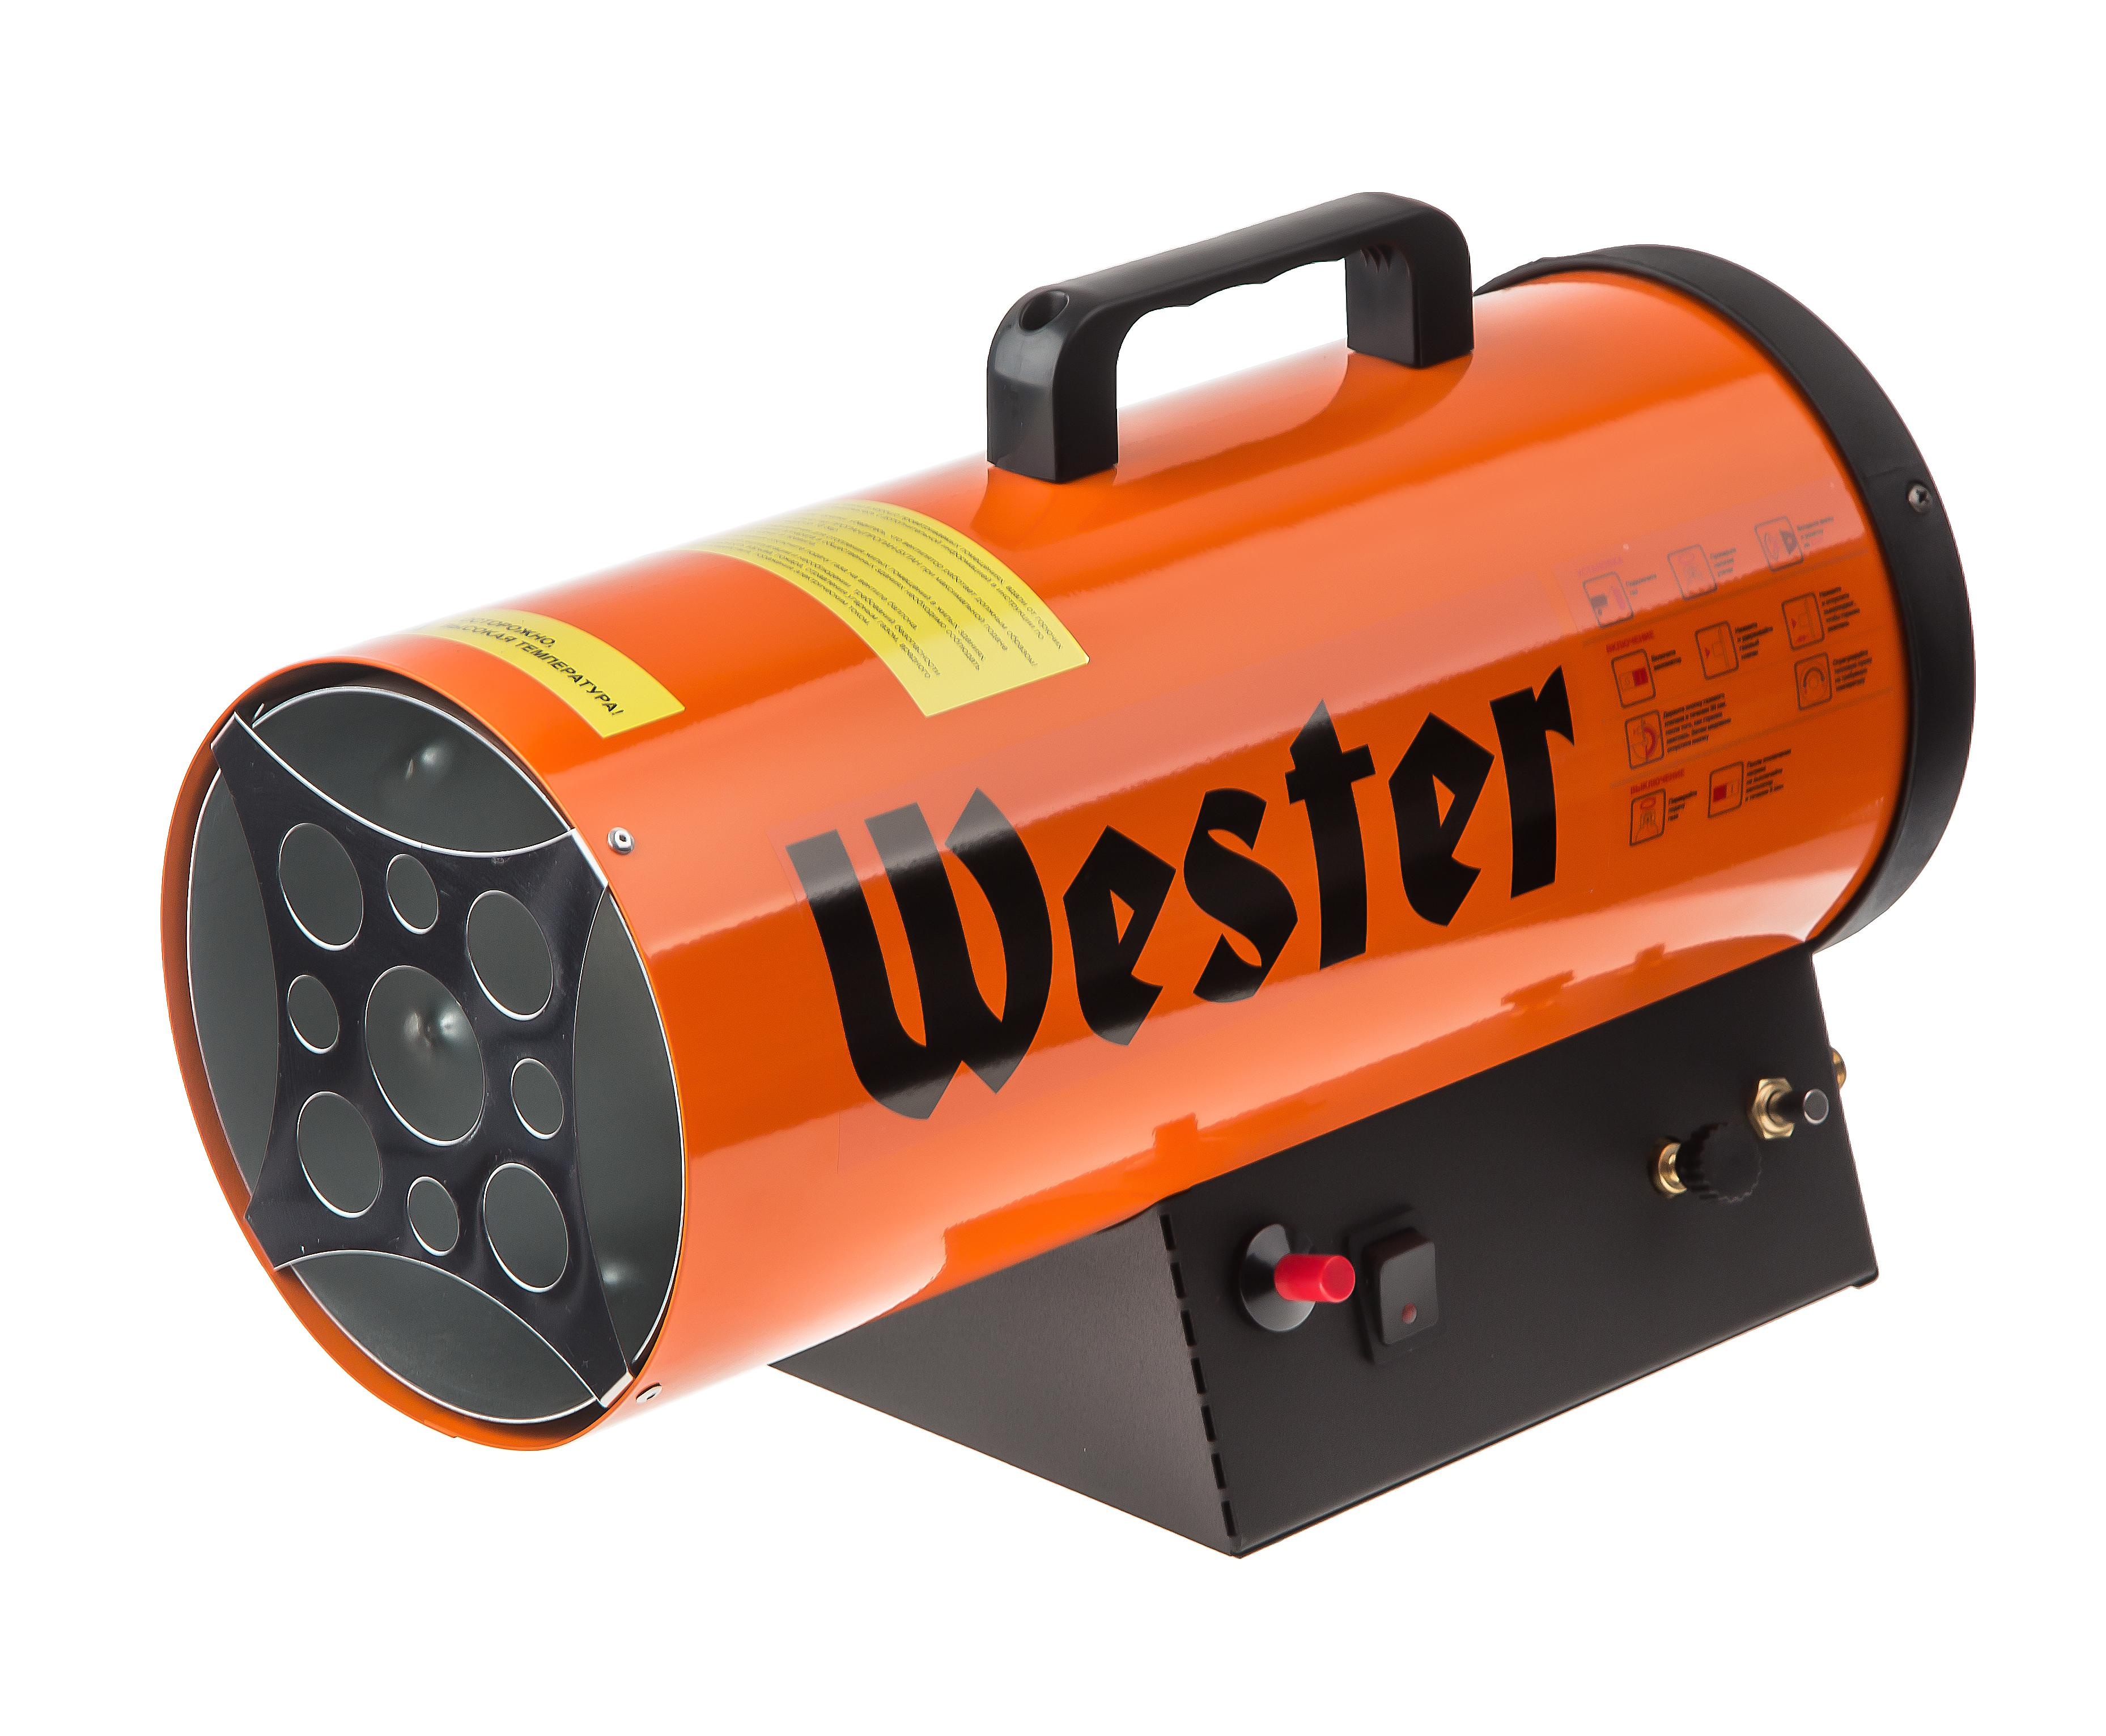 Тепловая пушка Wester Tg-20 газовая